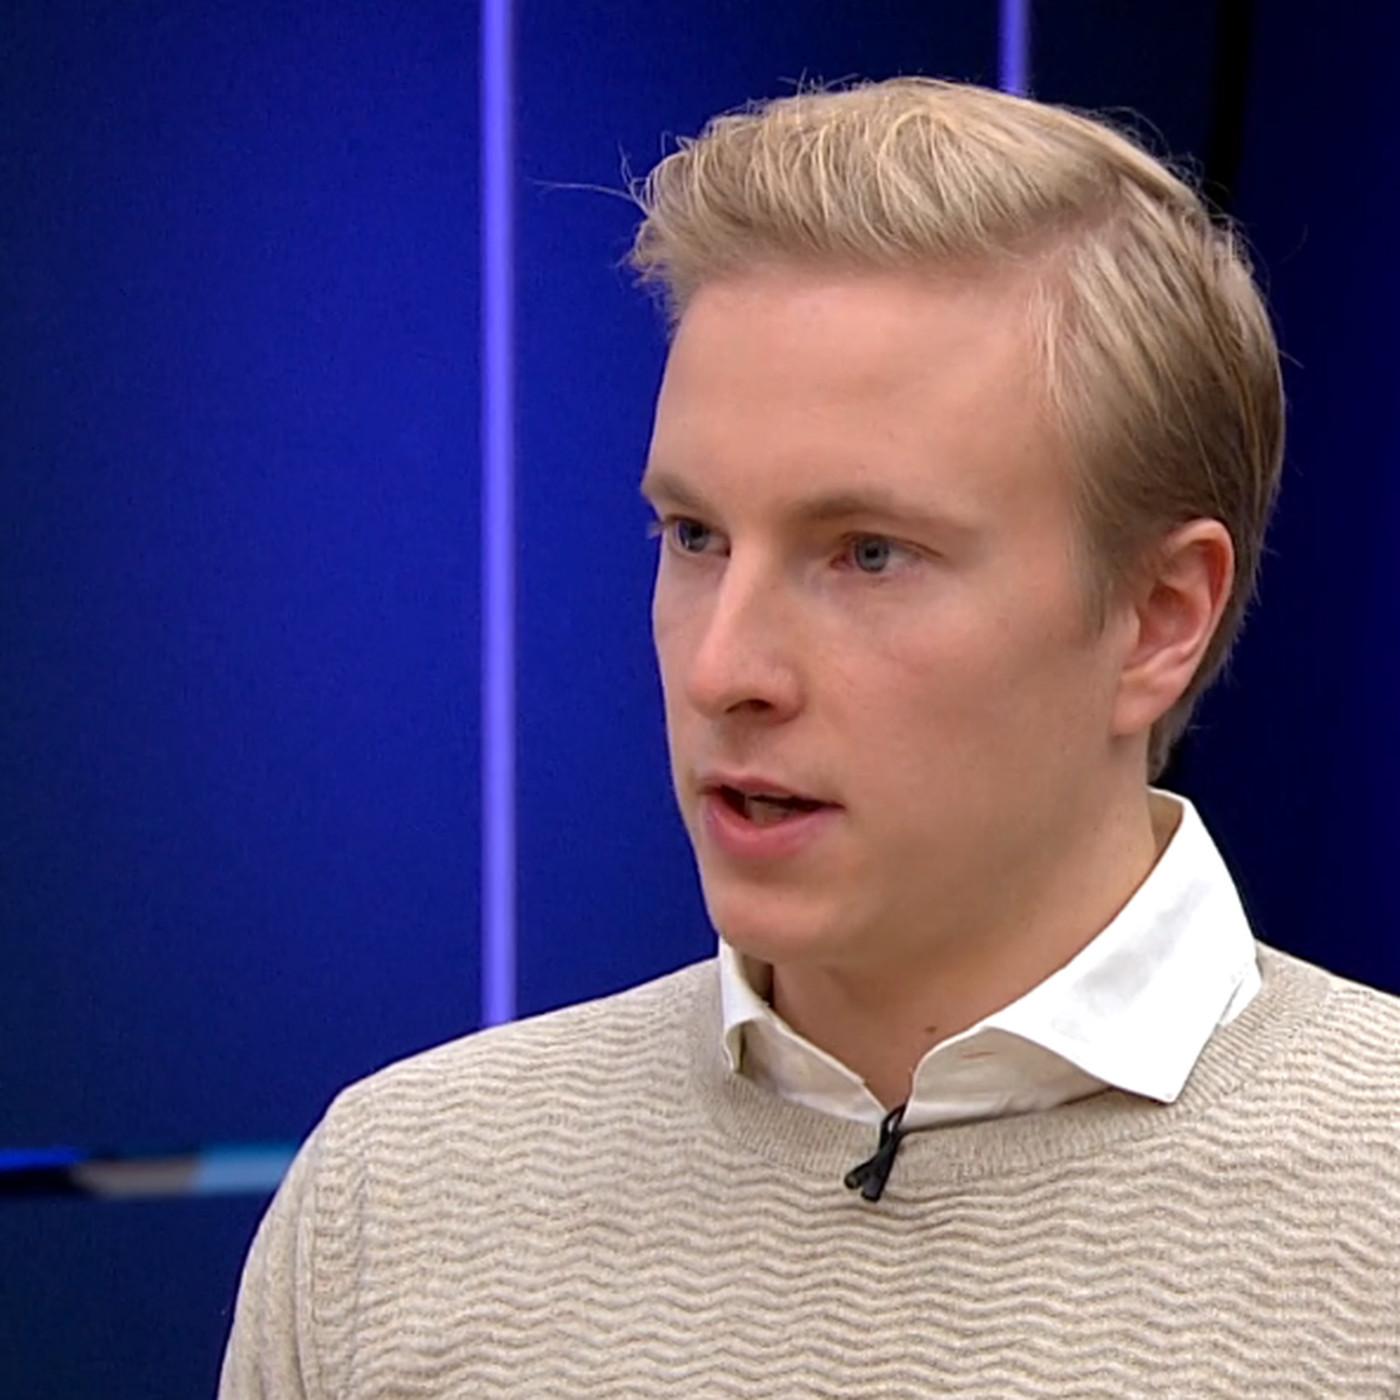 Datingside zit op zeyen duitse finland sexy extreme fuck free, In gay vrouw bakel.